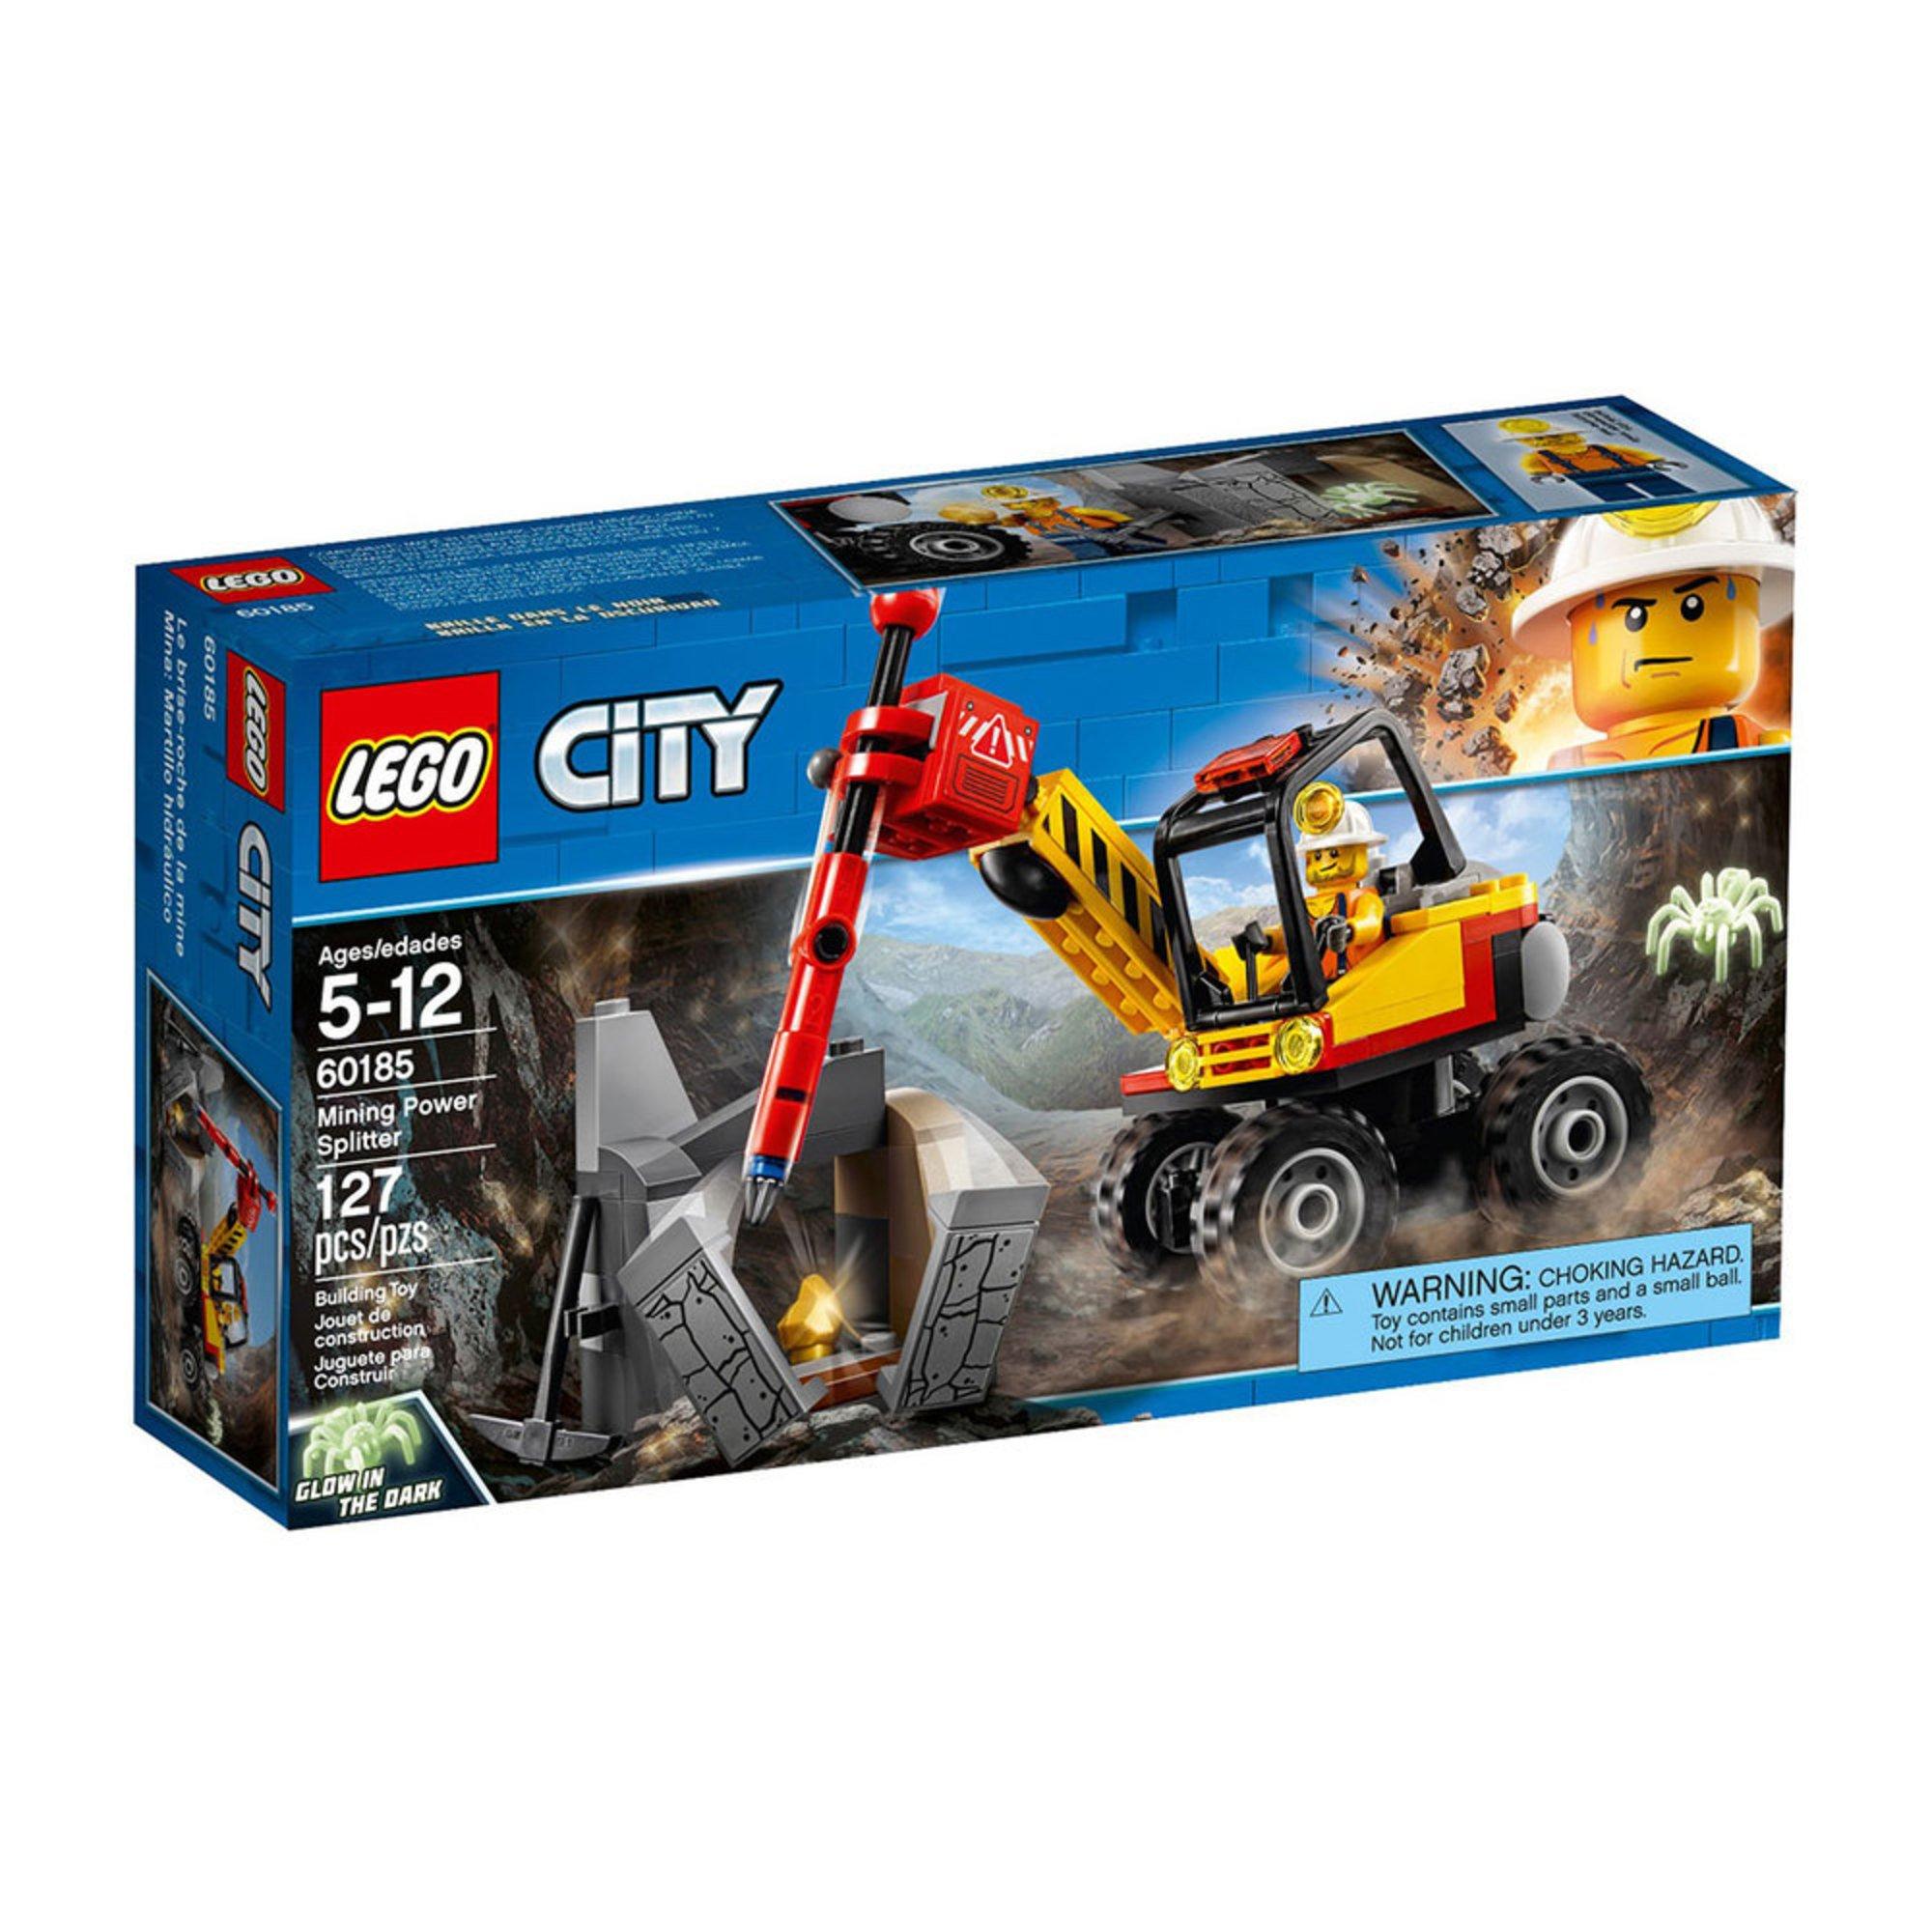 Lego City Mining Power Splitter 60185 Building Sets Kits